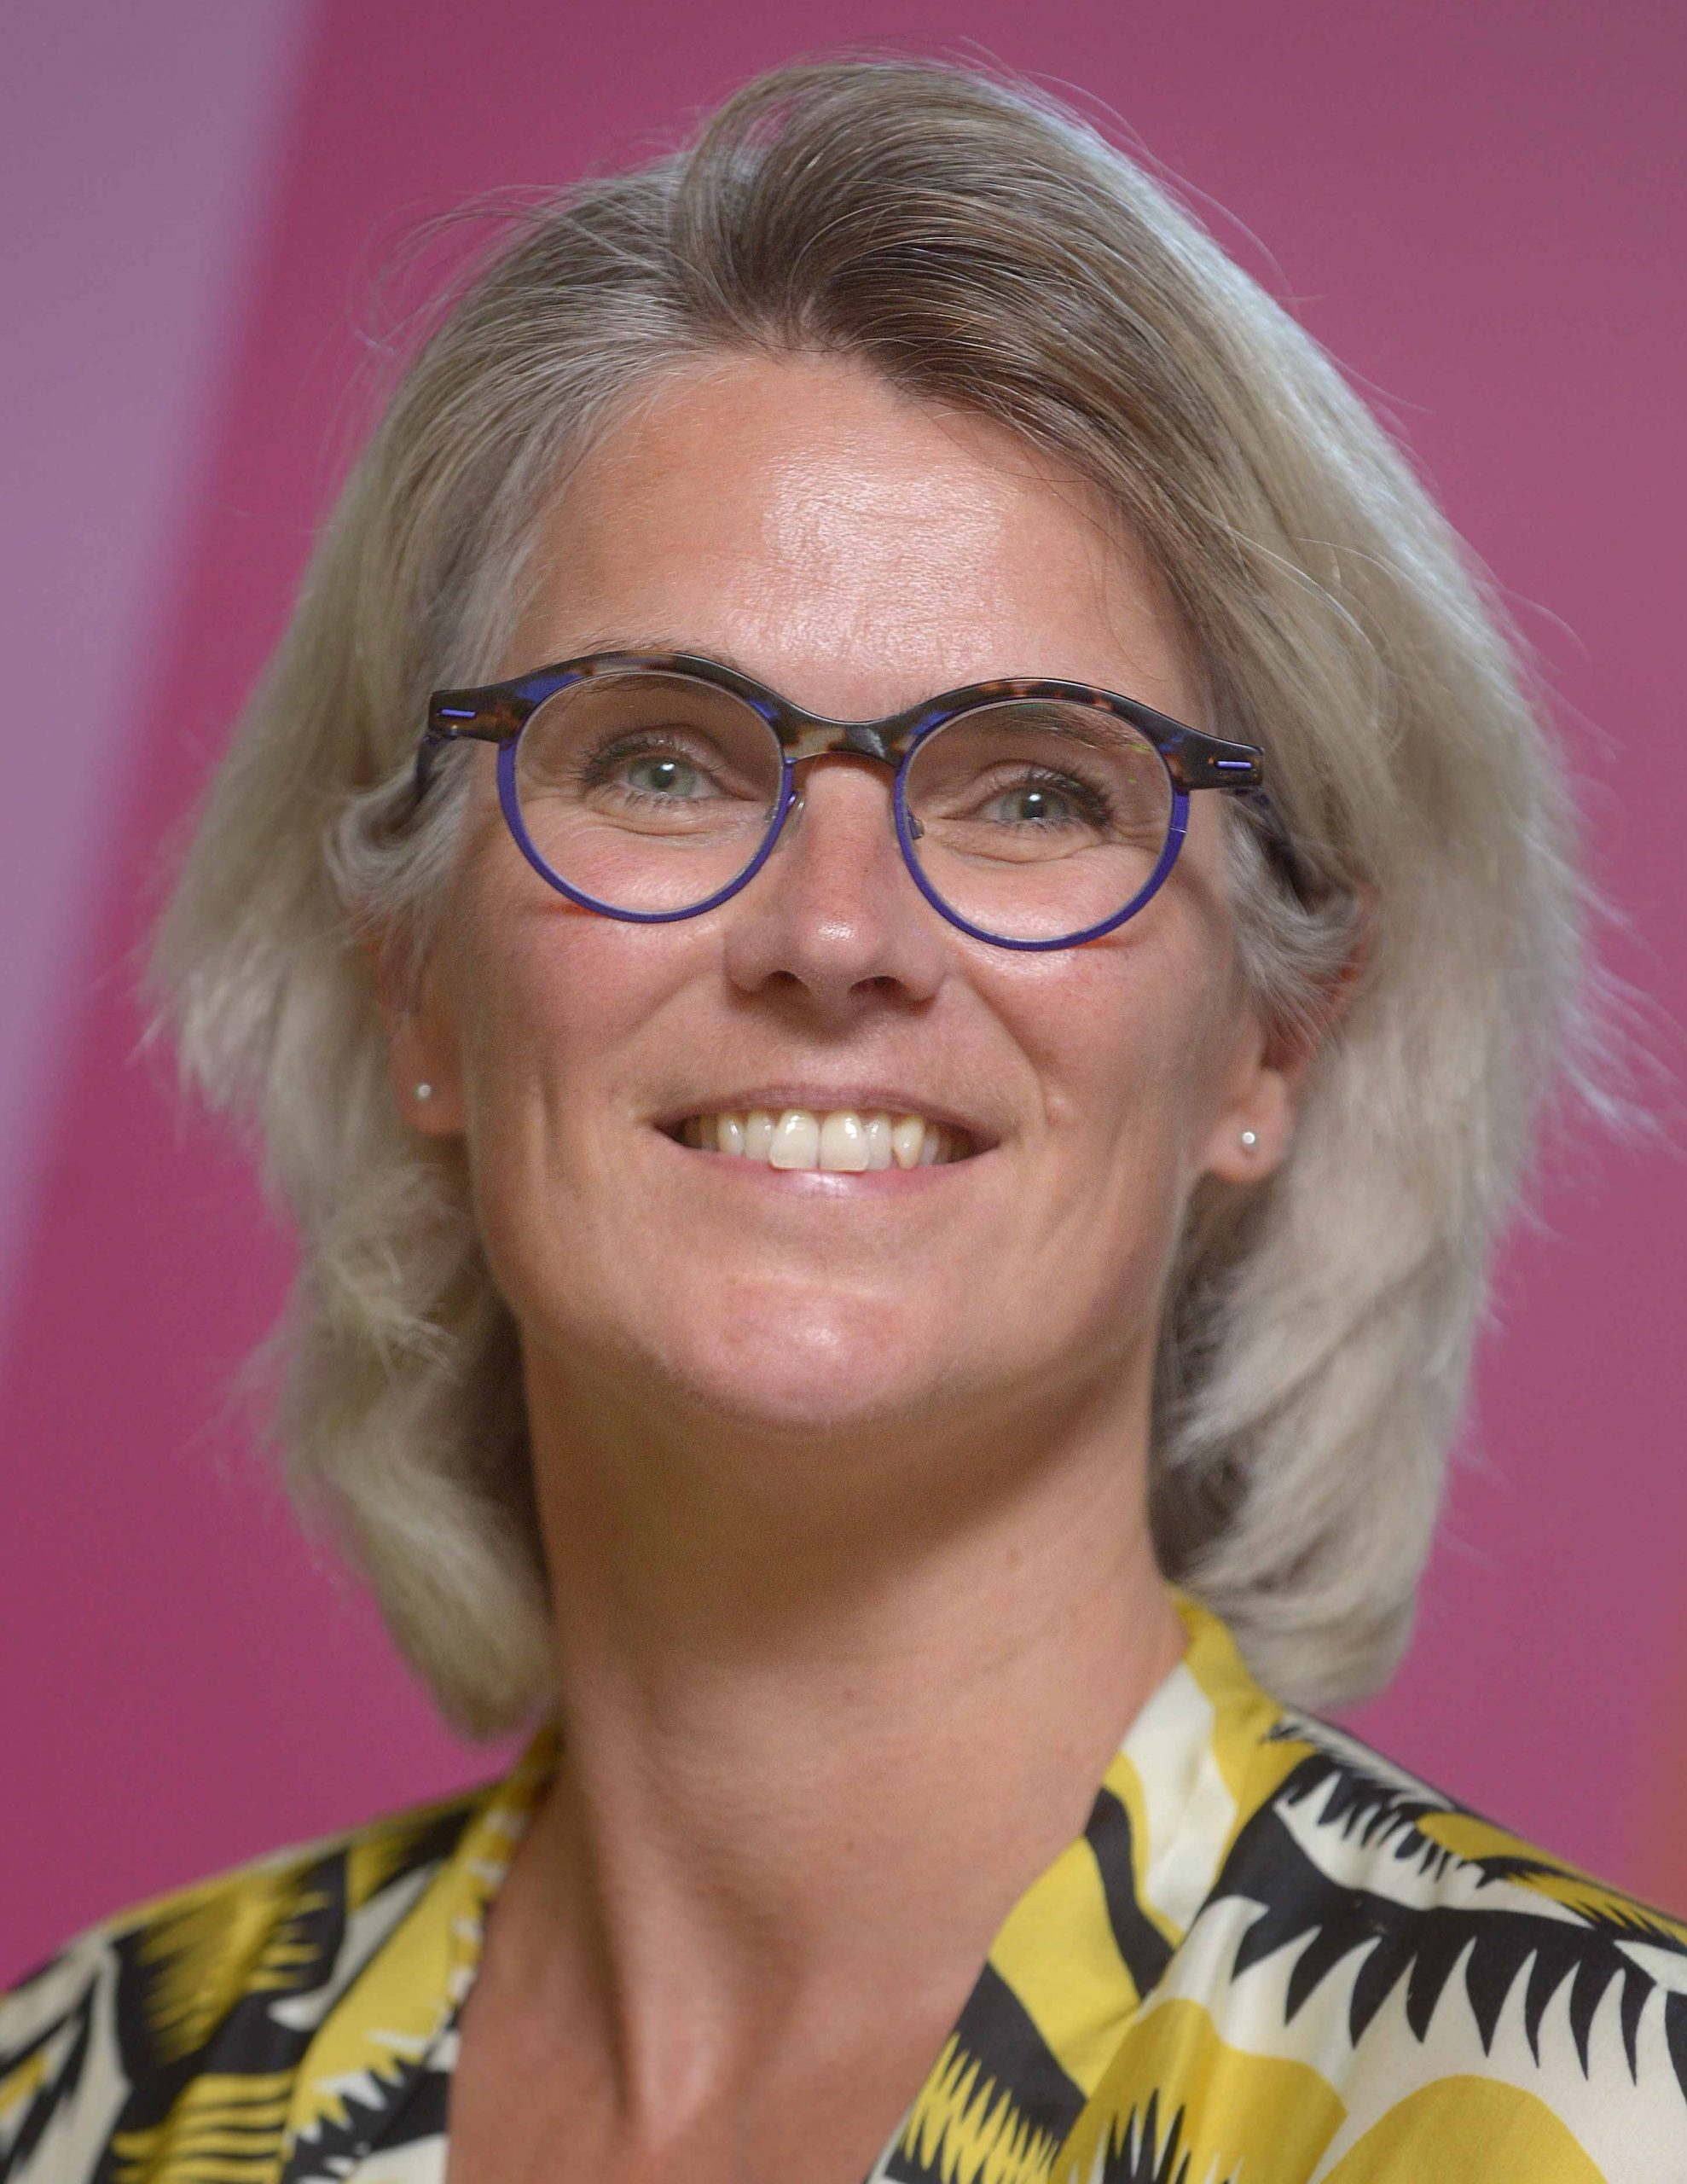 Dr. Ir. Ingrid Bakker Congres ERISGENOEG